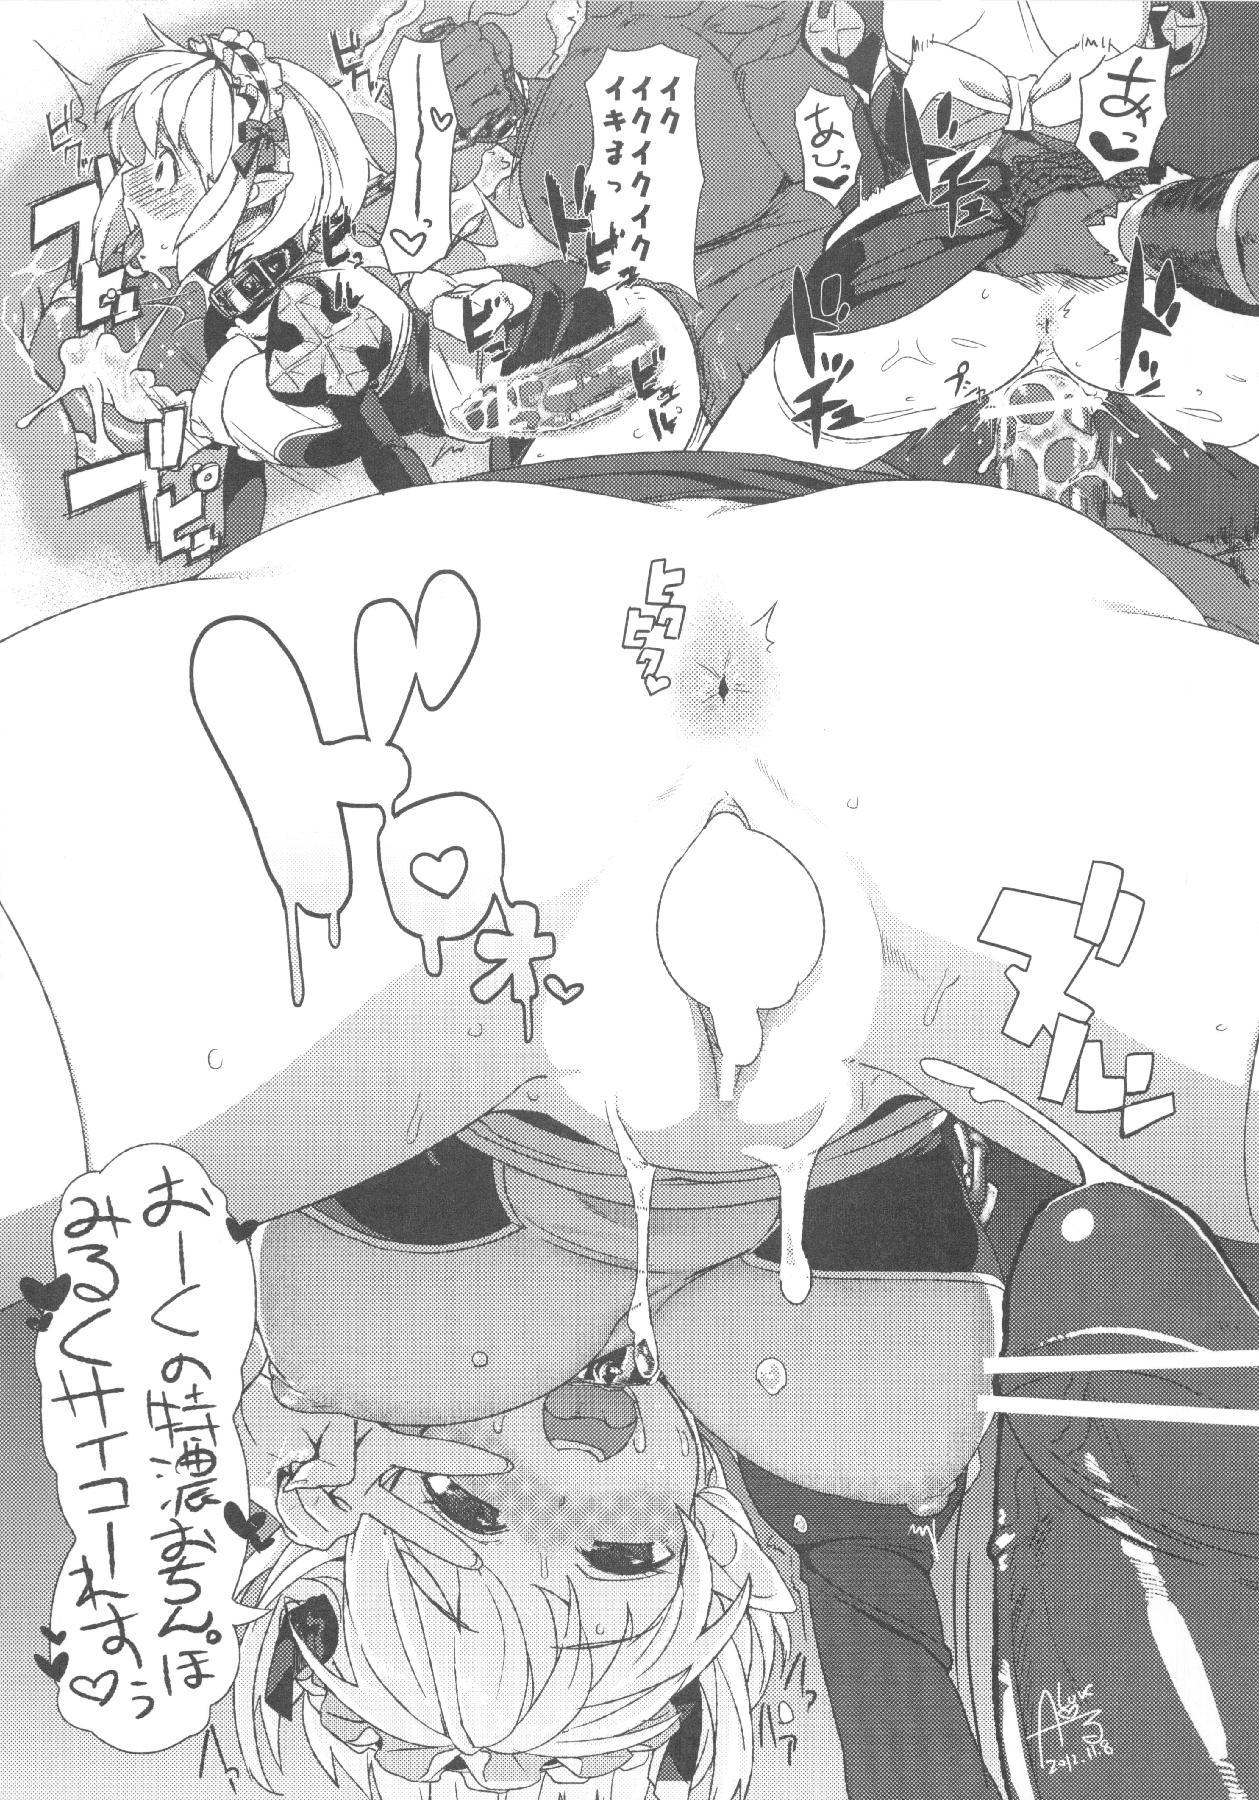 (C83) [Fatalpulse (Asanagi)] VictimGirls Compiled Vol.1 -Victimgirls Soushuuhen 1- MMO Game Selection (Various) 183